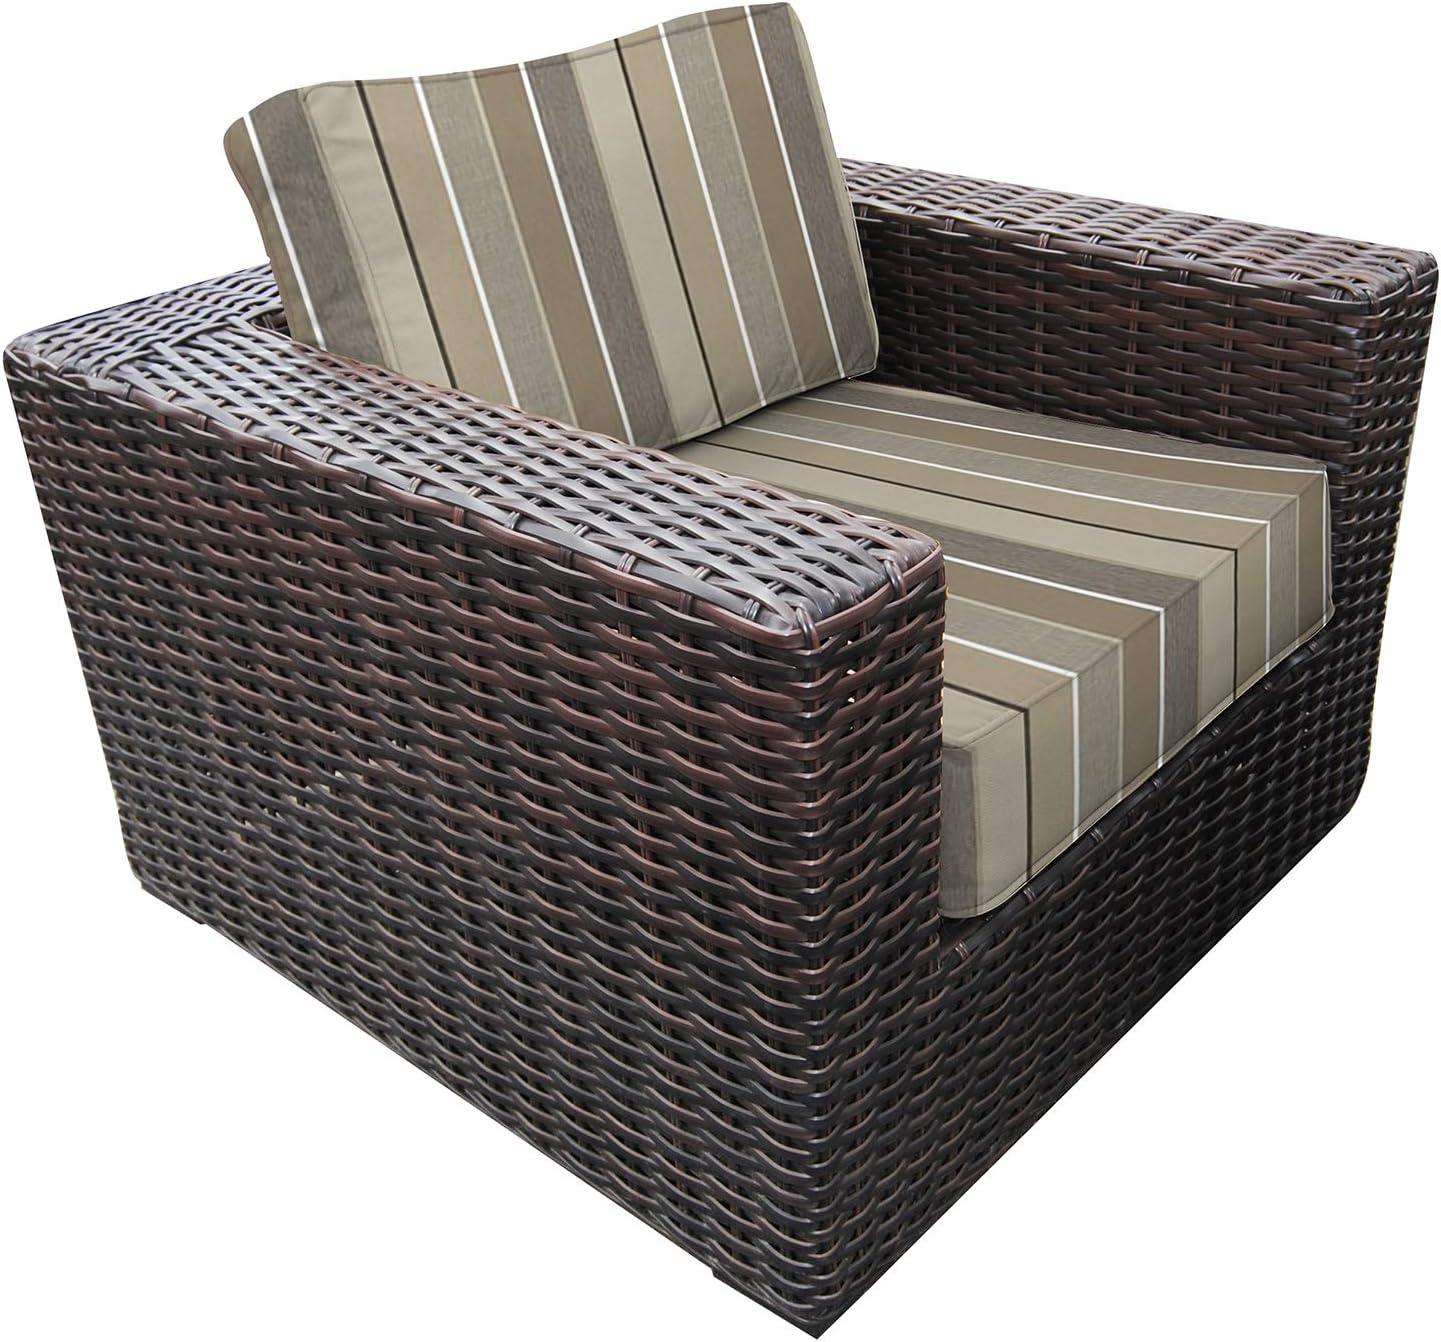 Amazon Com Envelor Santa Monica Outdoor Patio Furniture Club Chair Lightweight Wicker Rattan Base Includes Milano Char Sunbrella Cushions Garden Outdoor